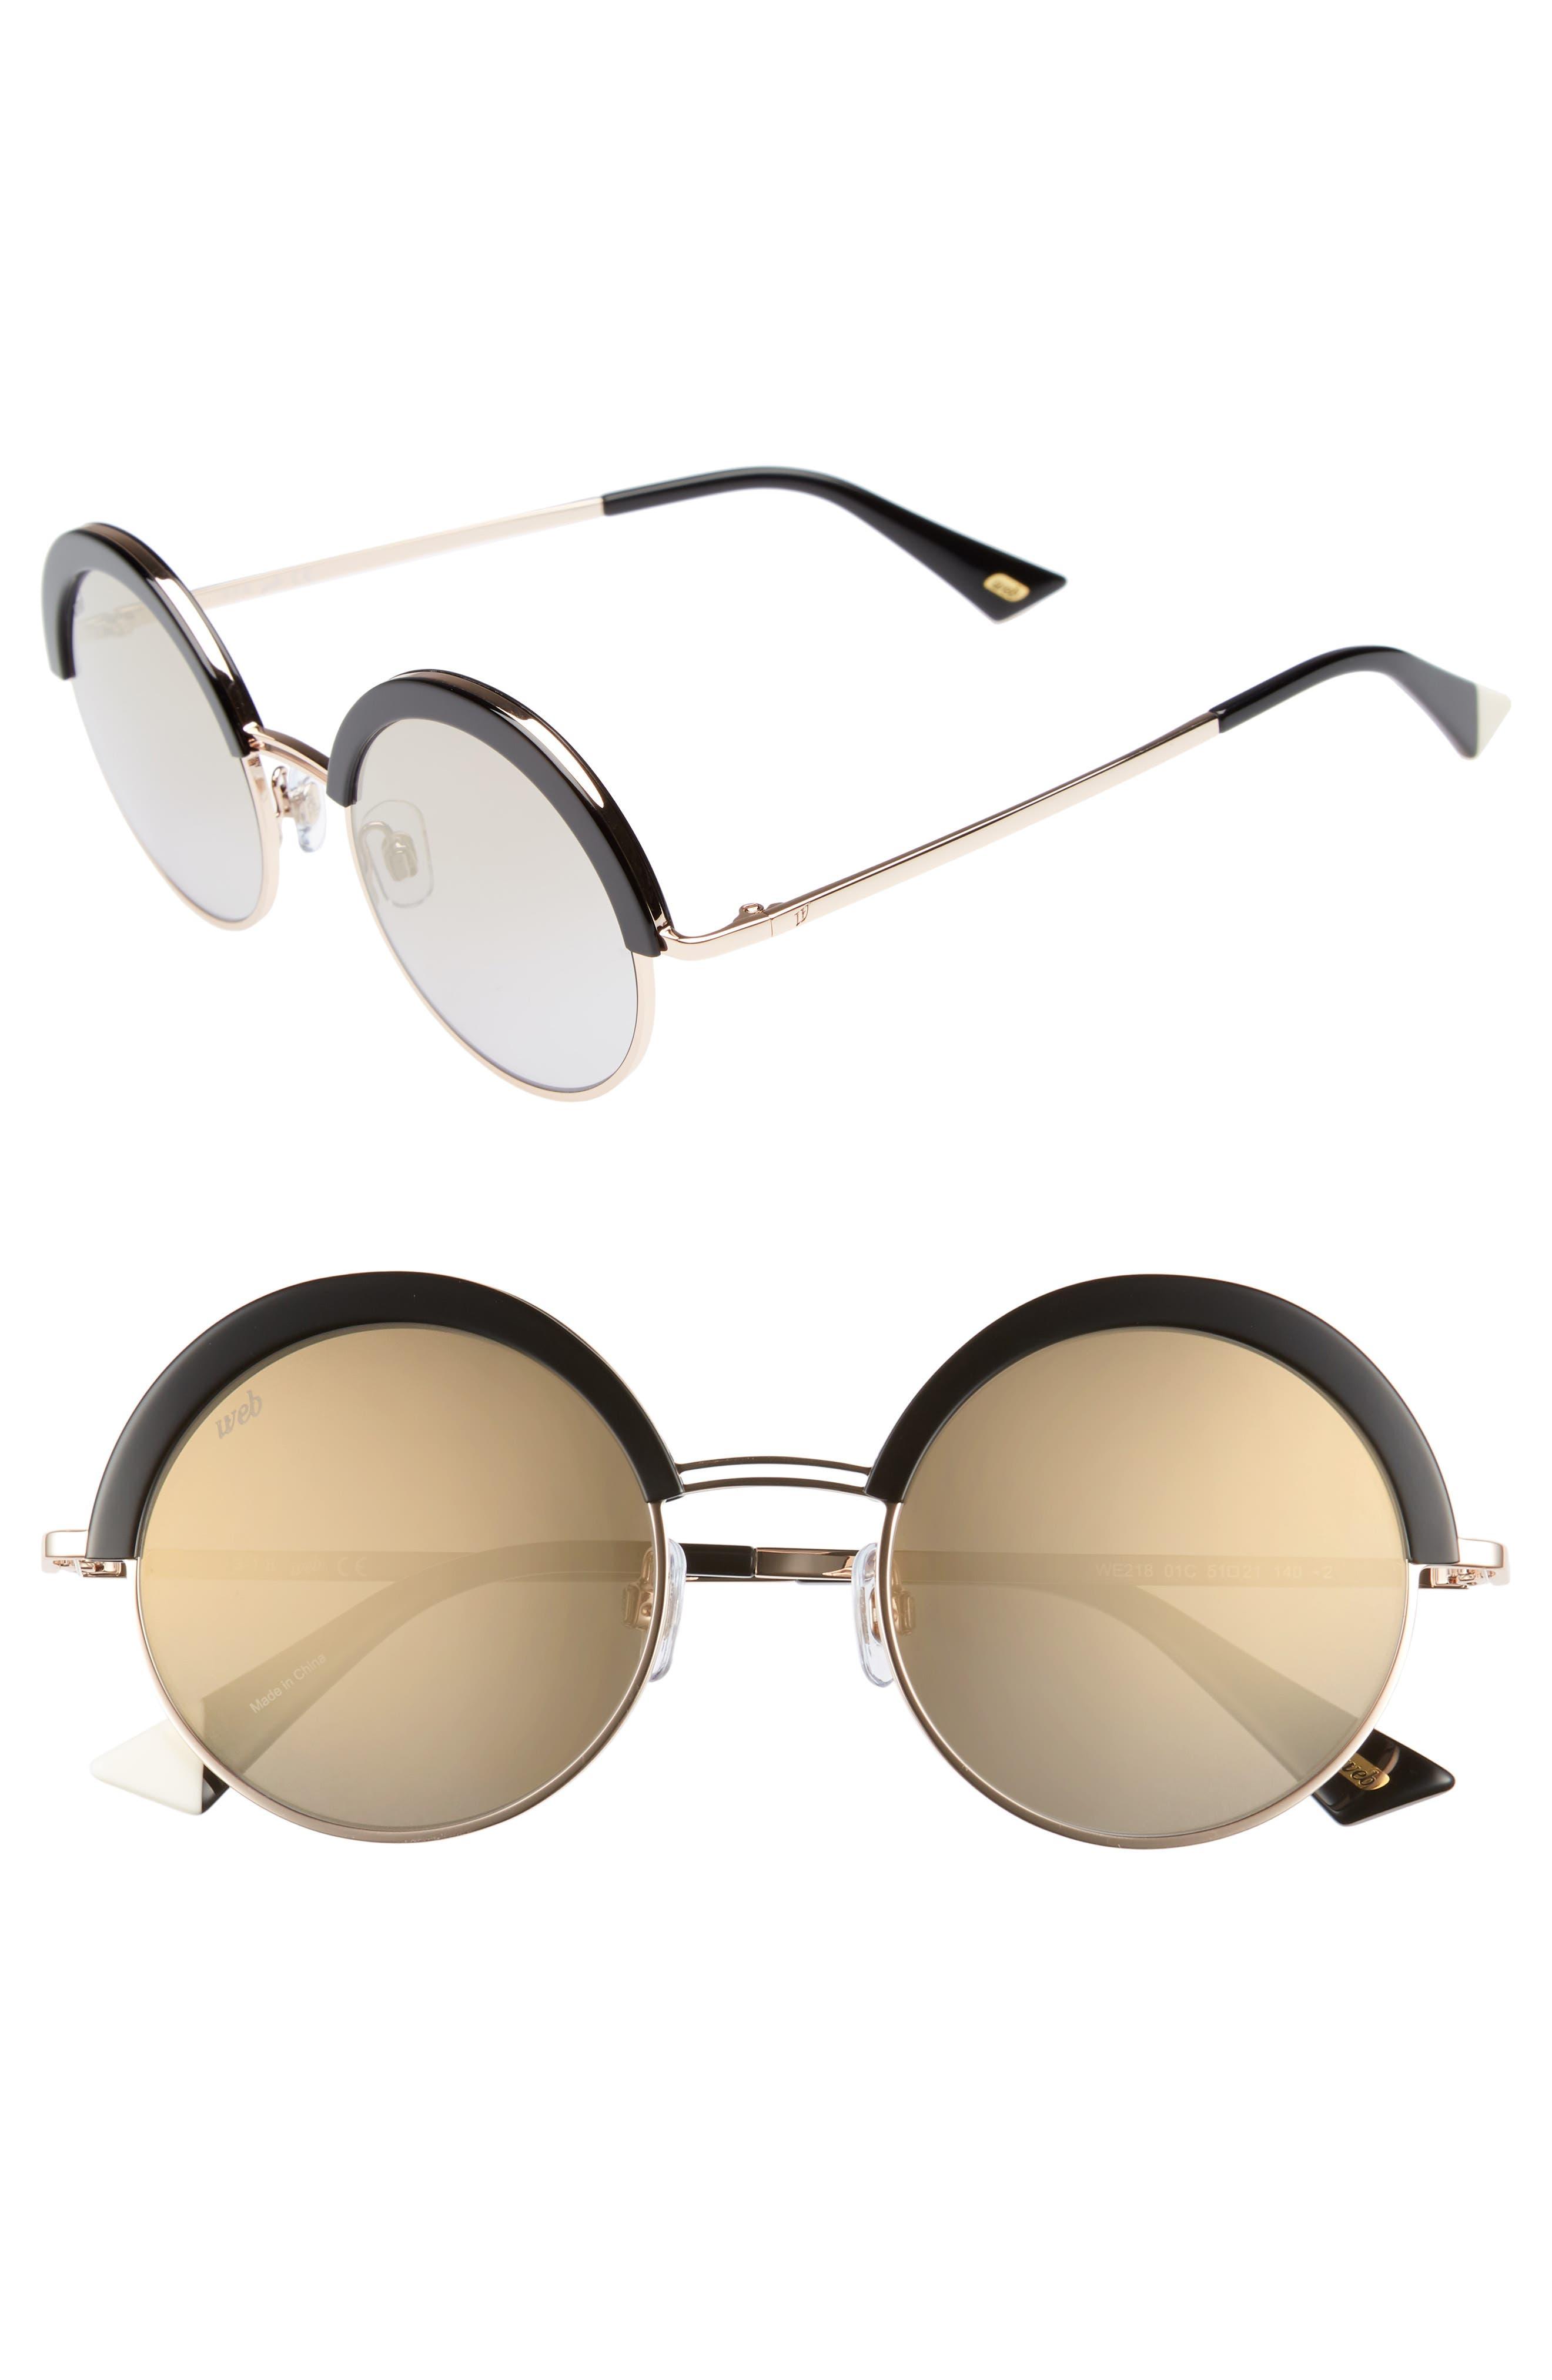 51mm Round Sunglasses,                             Main thumbnail 1, color,                             SHINY BLACK/ SMOKE MIRROR